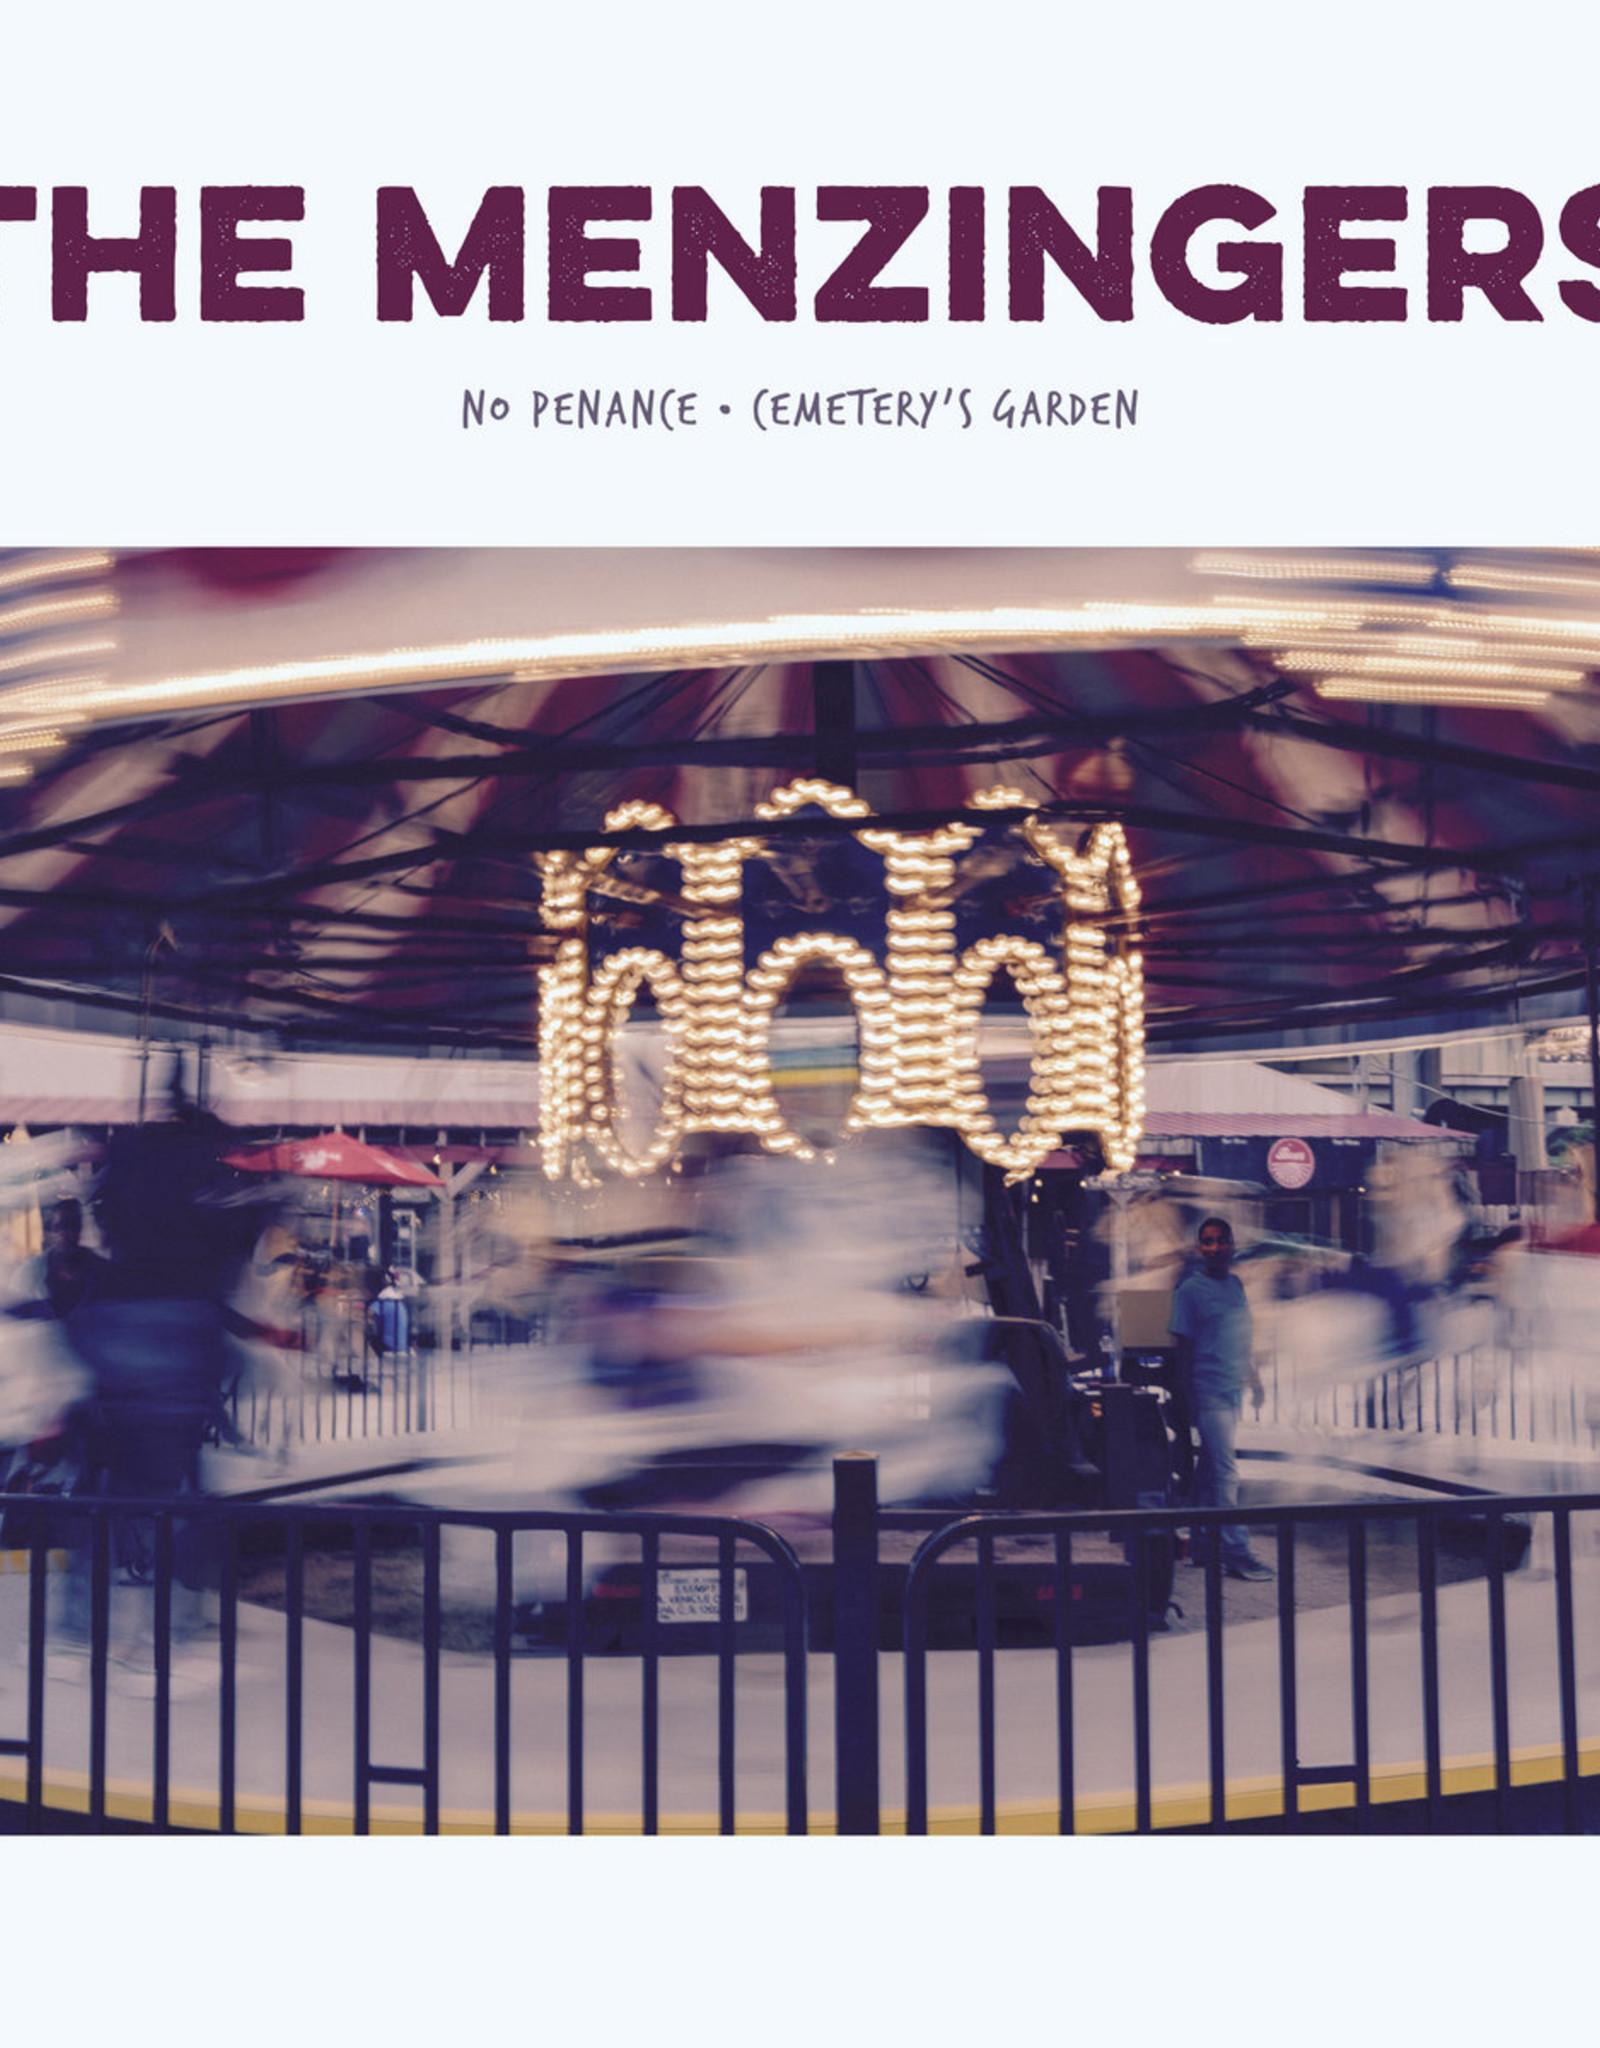 The Menzingers - No Penance B/W Cemetery'S Garden